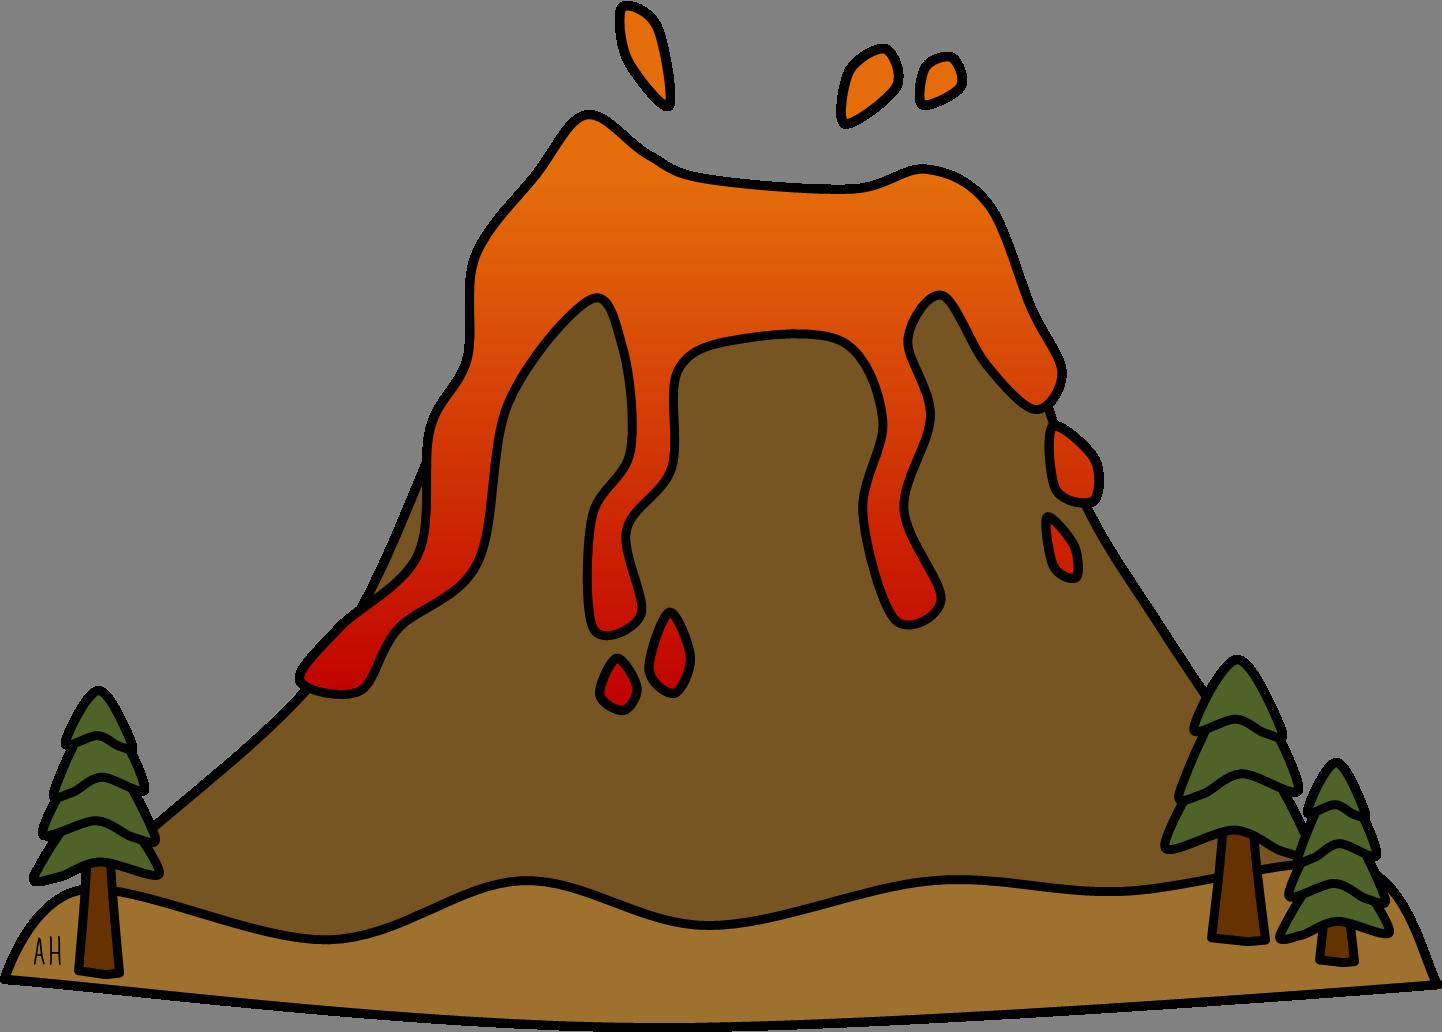 Free Volcano Cliparts, Download Free Clip Art, Free Clip Art.